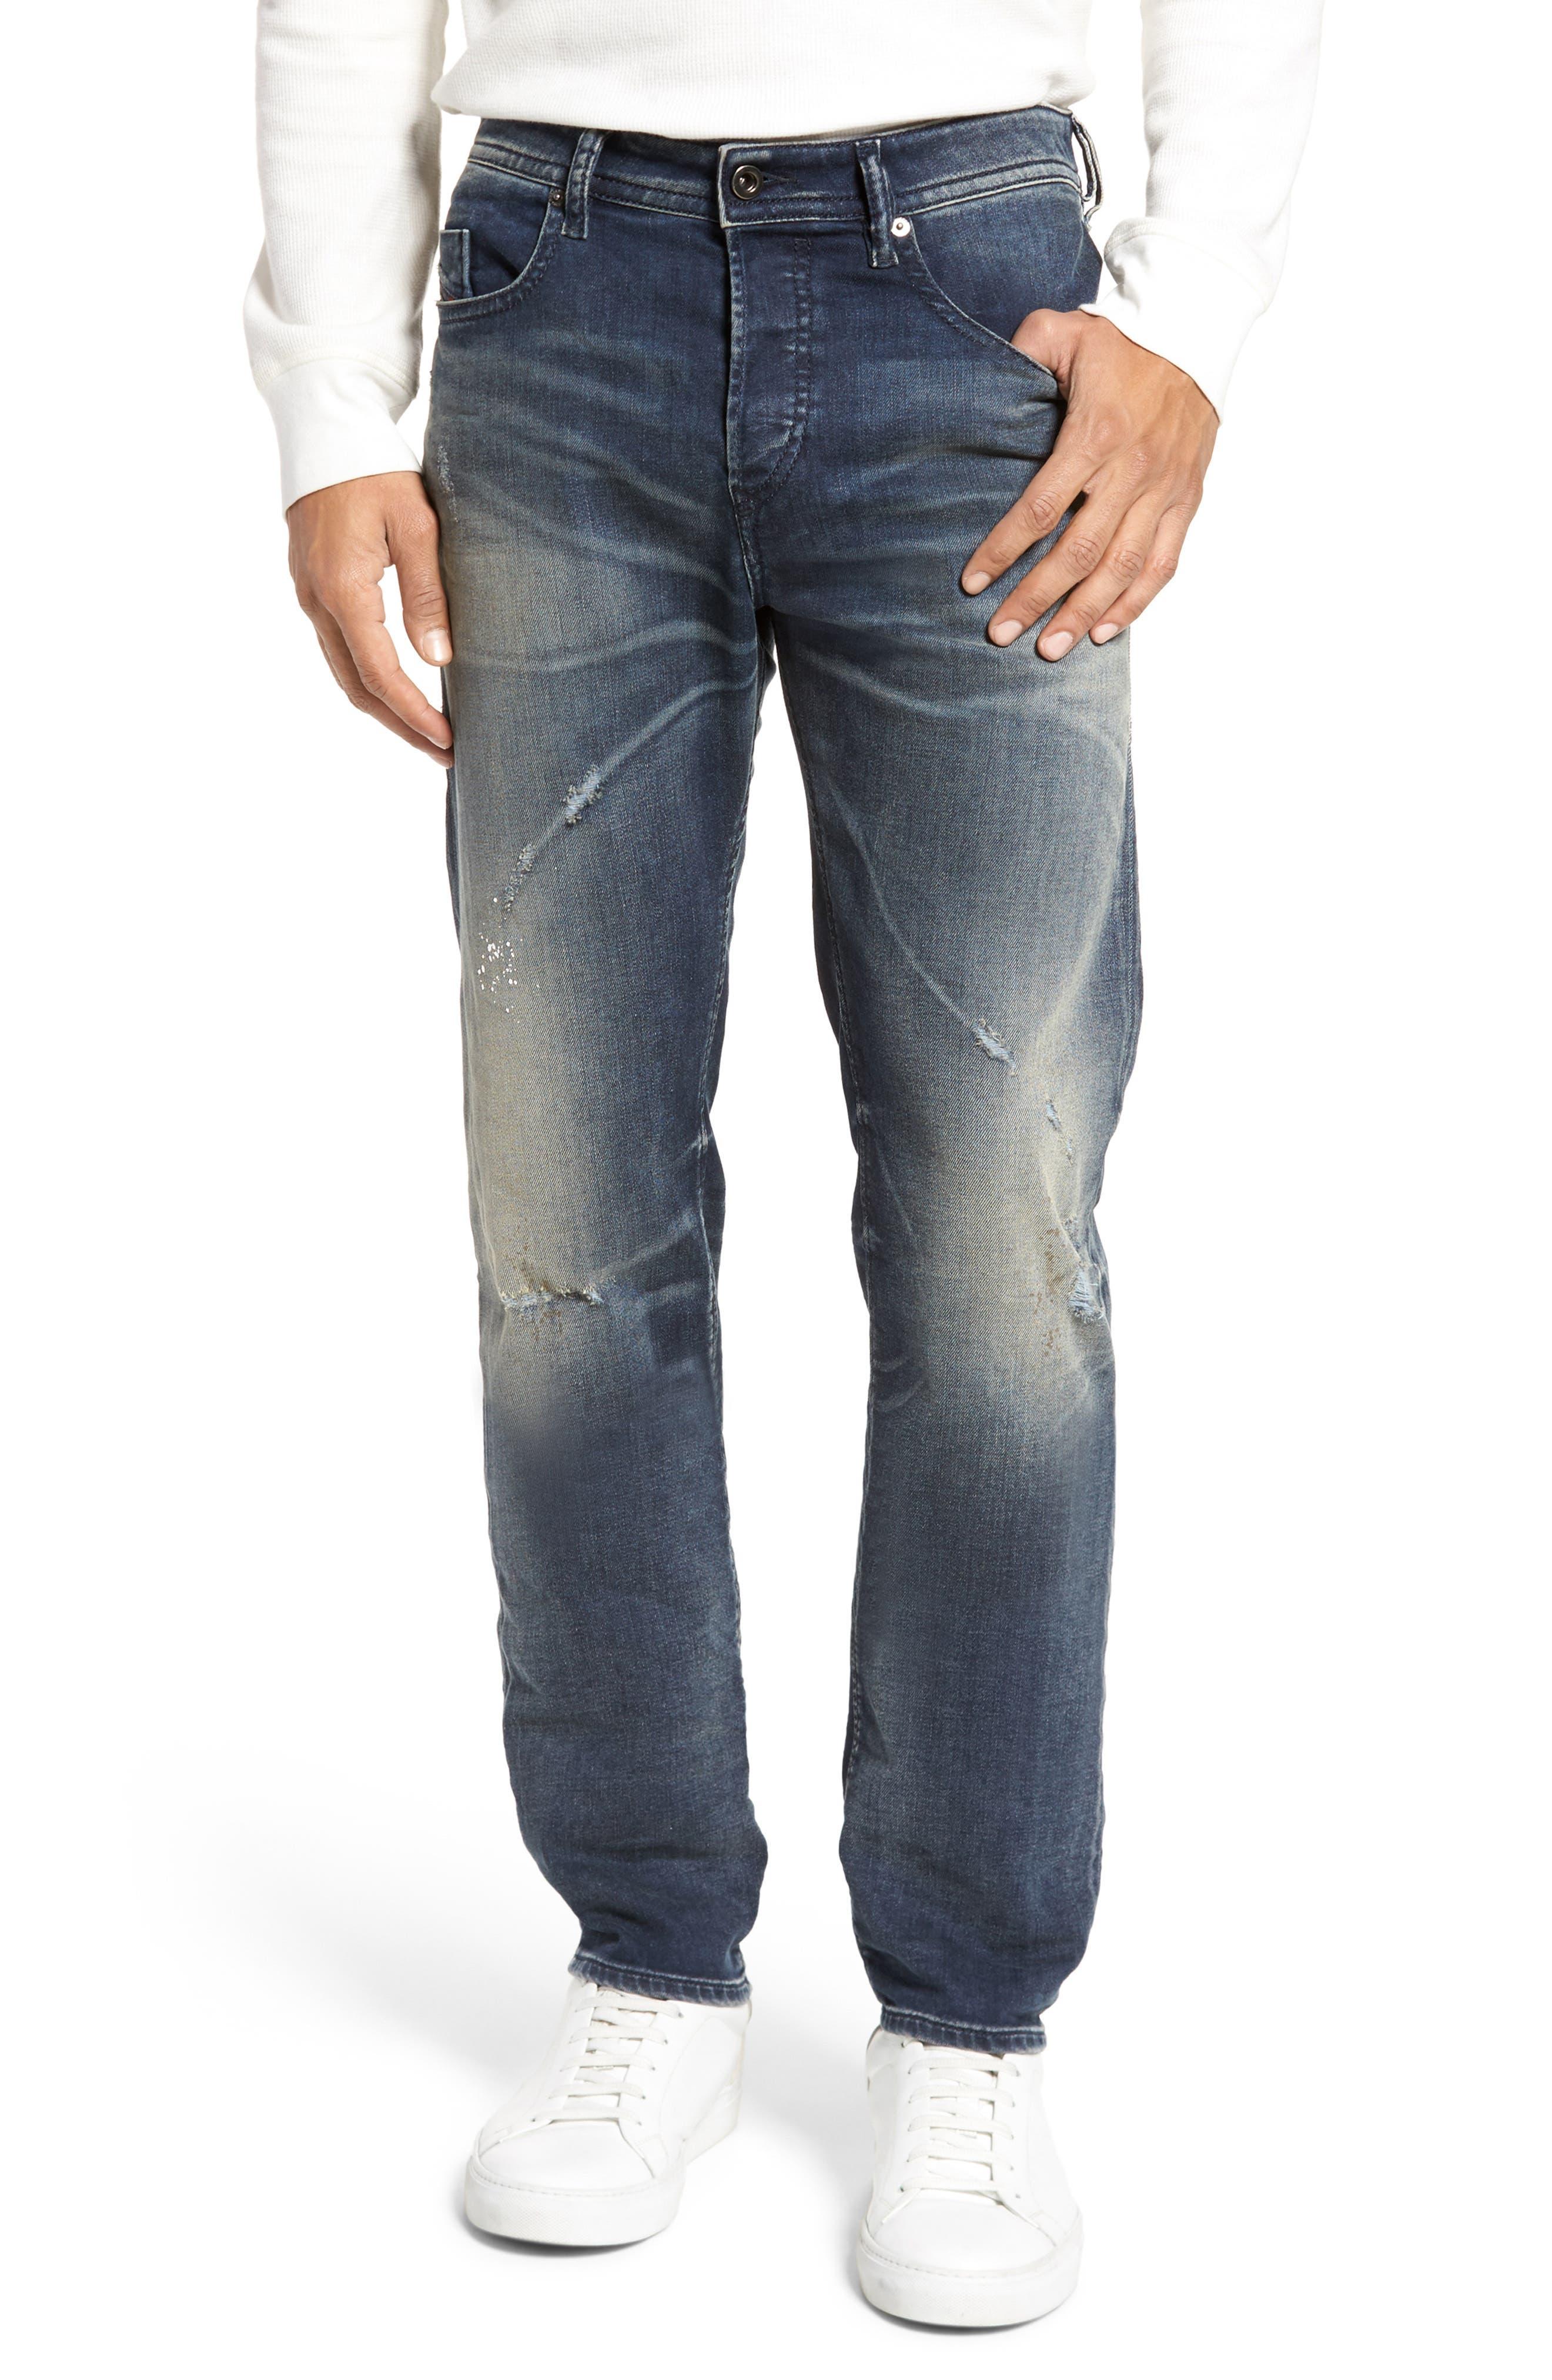 Buster Slim Straight Leg Jeans,                         Main,                         color, 0687U